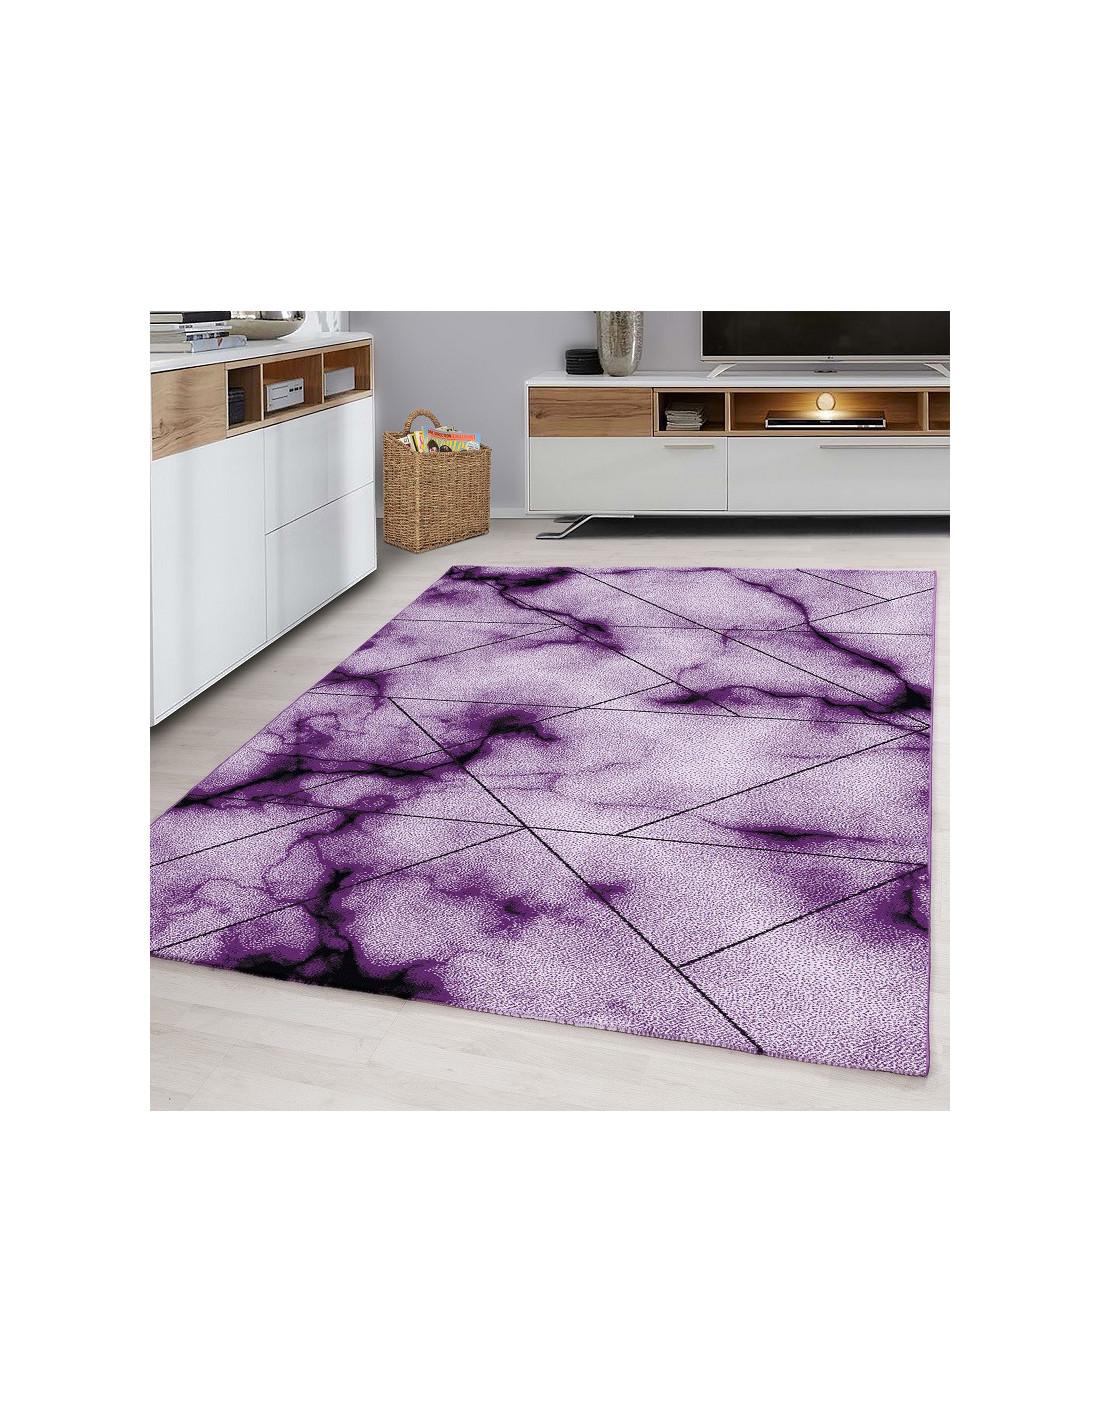 Modern designer living room youth room carpet PARMA 9320 purple